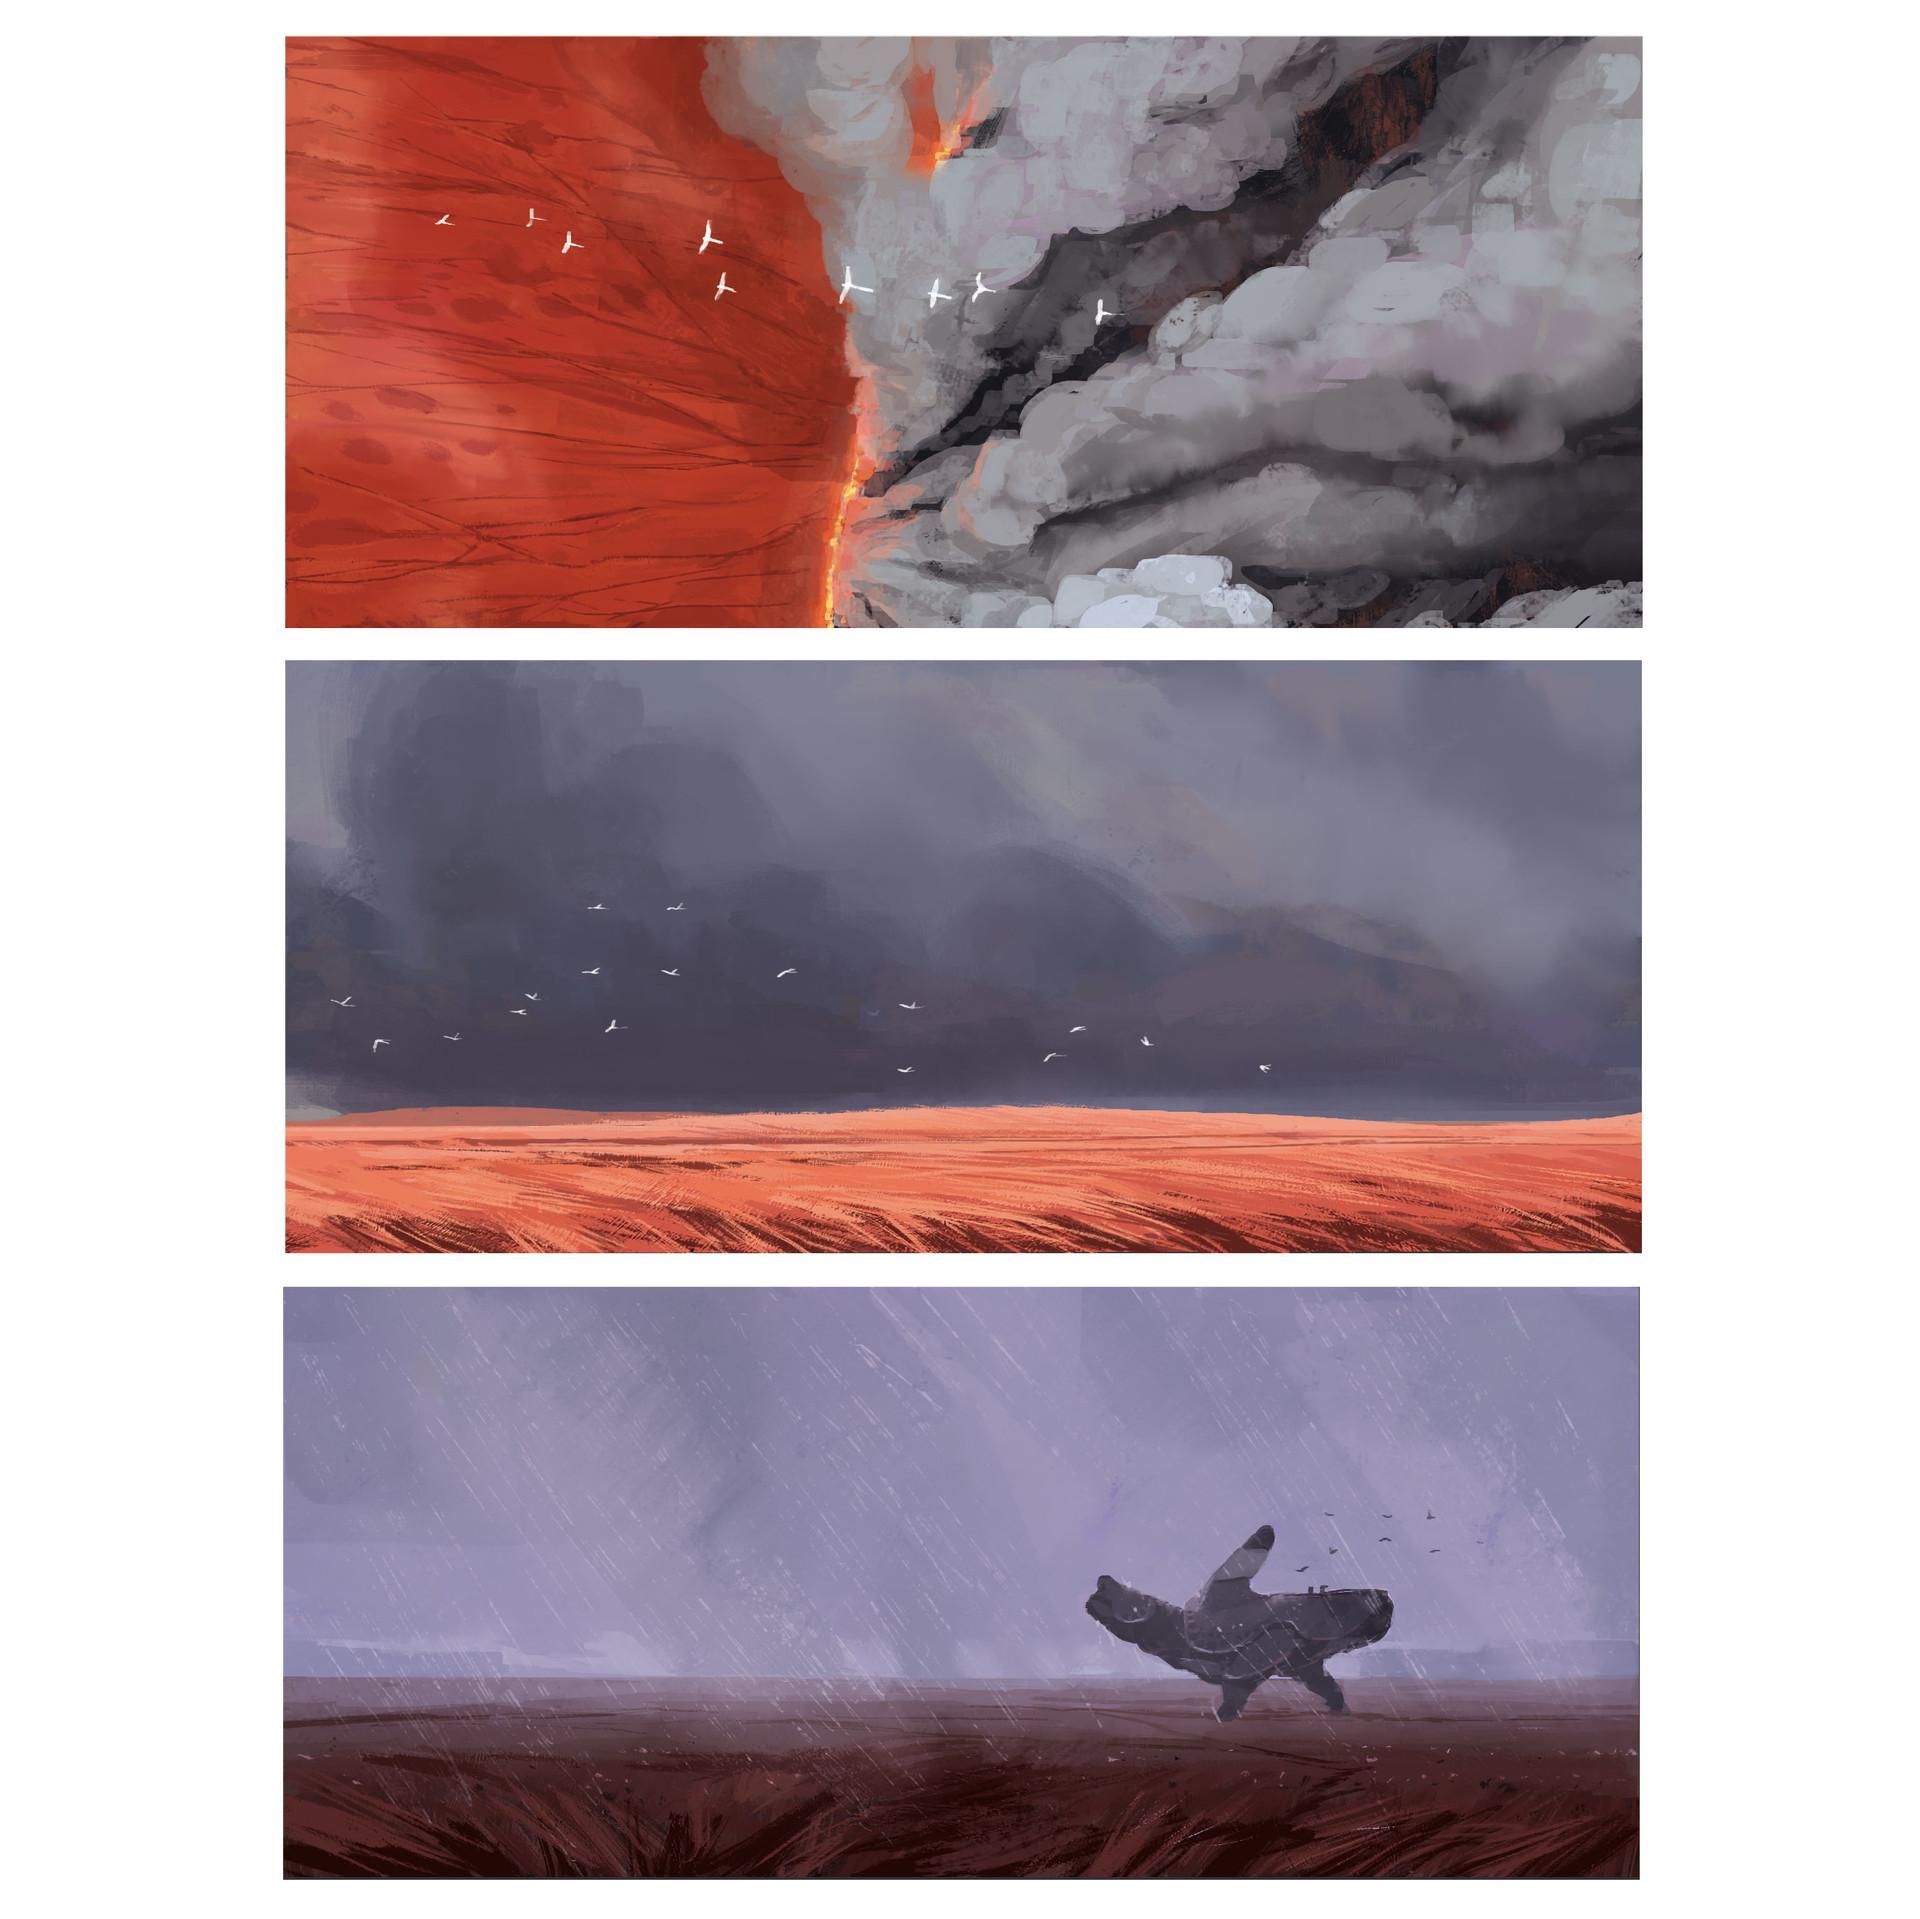 [Reflexion] Les oeuvres qui vous inspirent Alexander-ostrowski-05-grassland-colorroughs-insta3